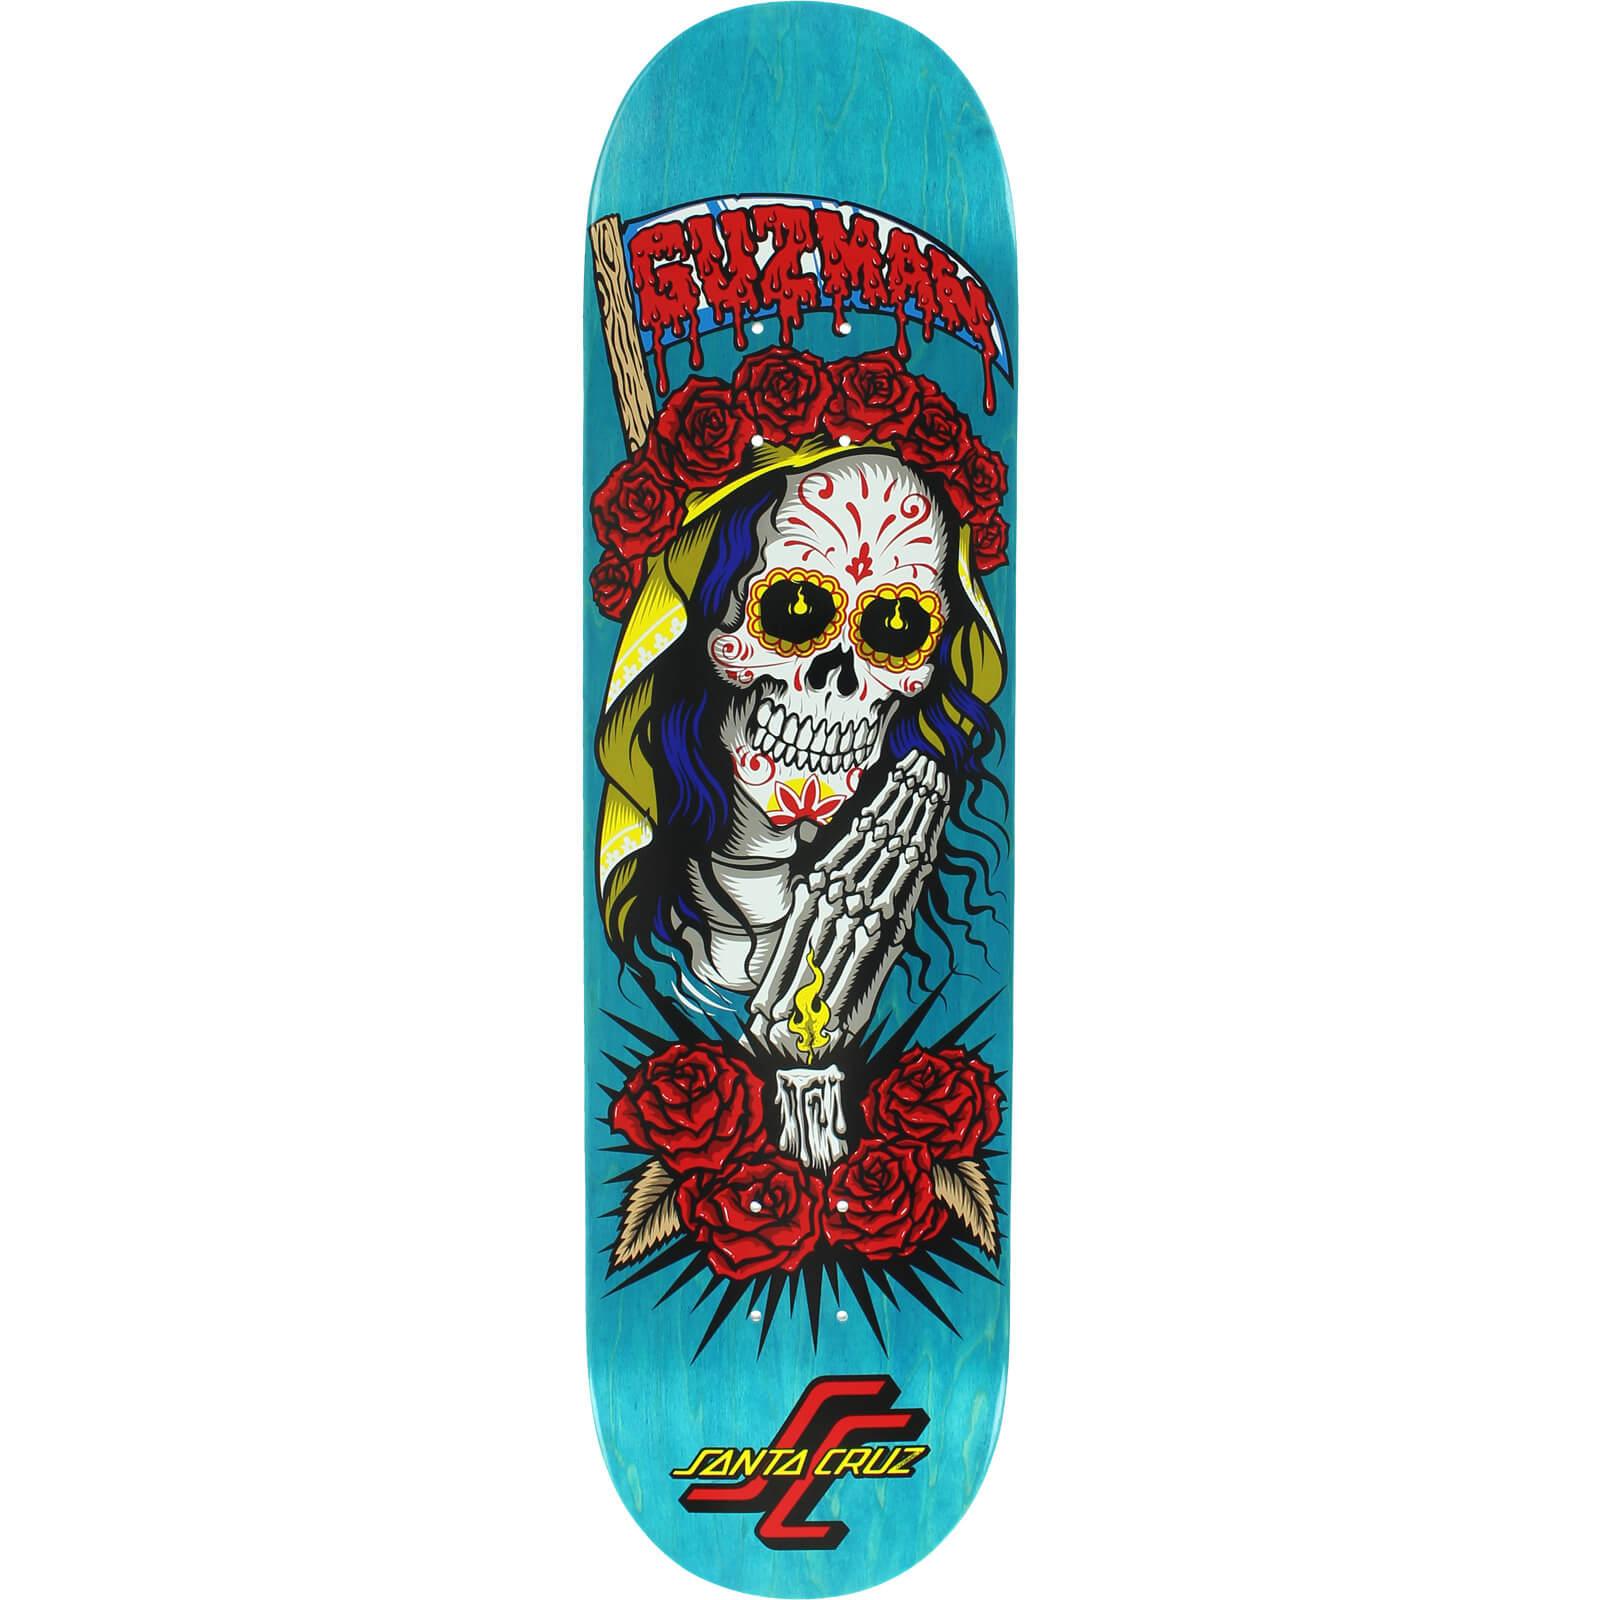 Santa Cruz Skateboards Emmanuel Guzman Muerte Skateboard